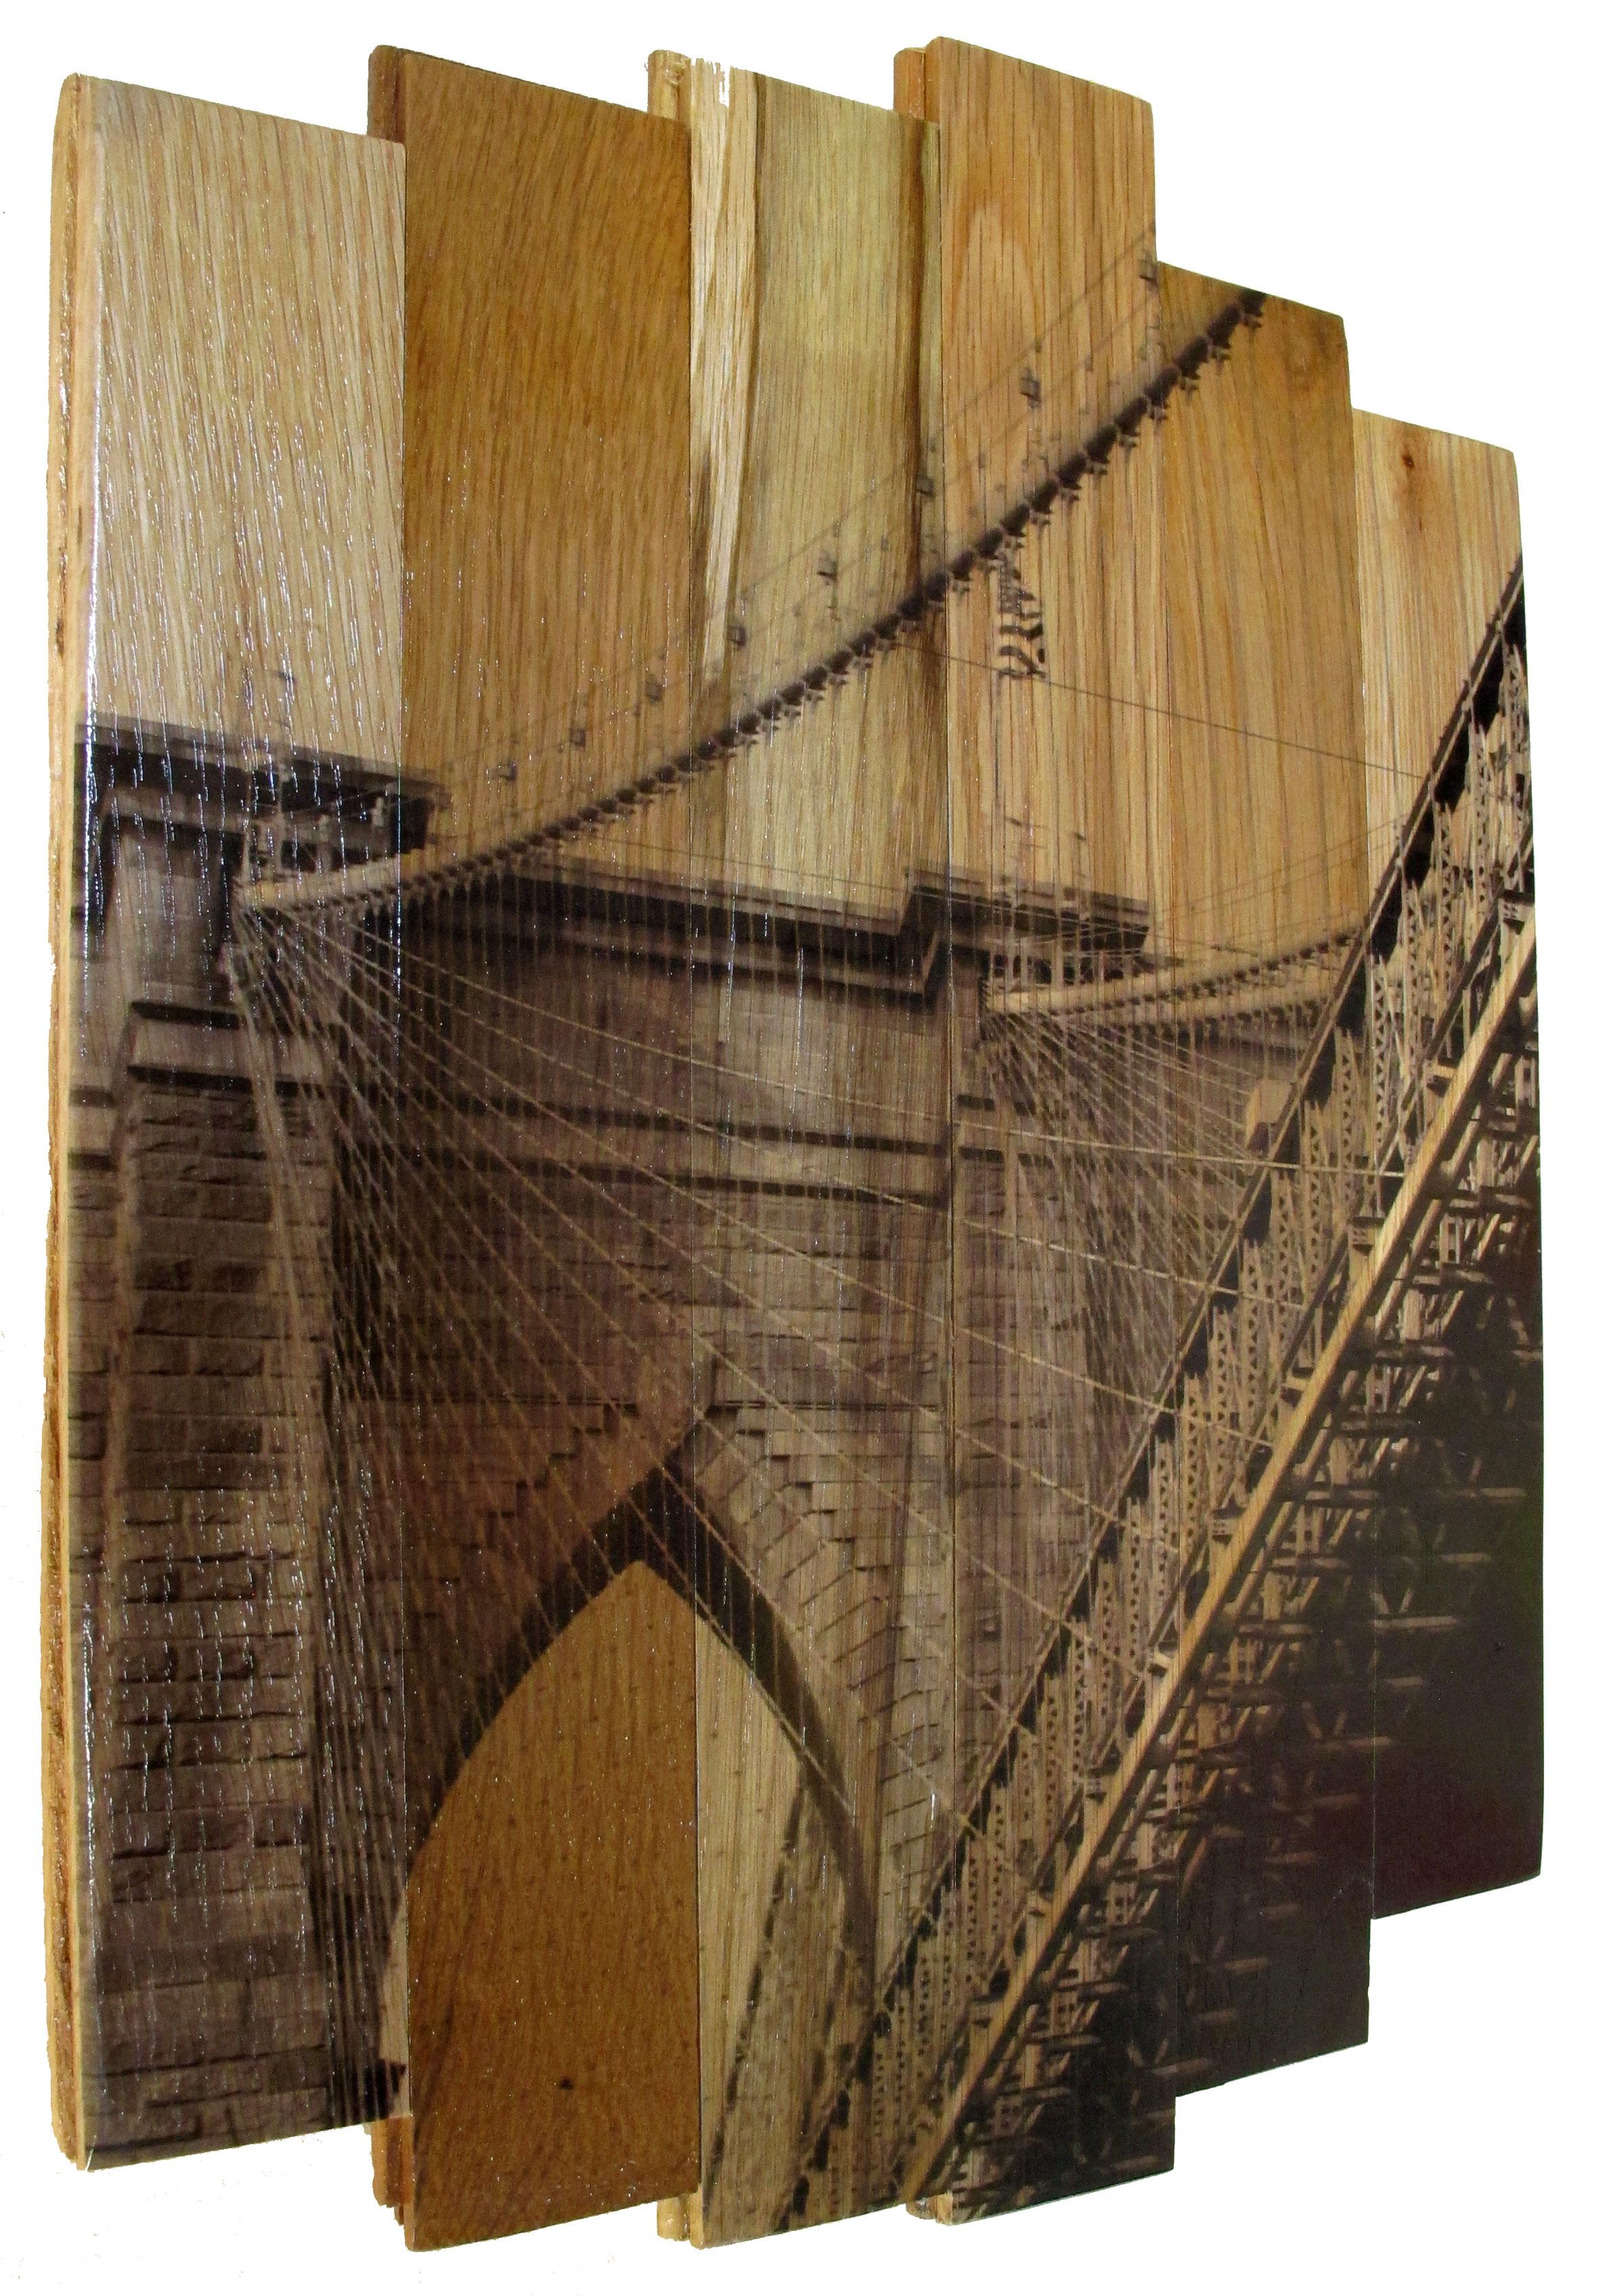 Brooklyn Bridge II,  2016 c print on reclaimed wood floor 17 x 14 x 1.5 in / 43 x 35.5 x 4 cm  Unique